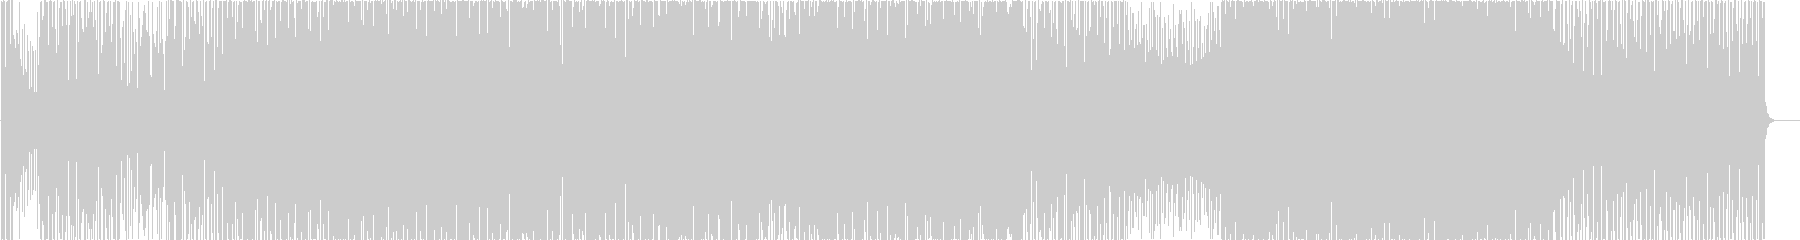 mudd echoの未再生の波形